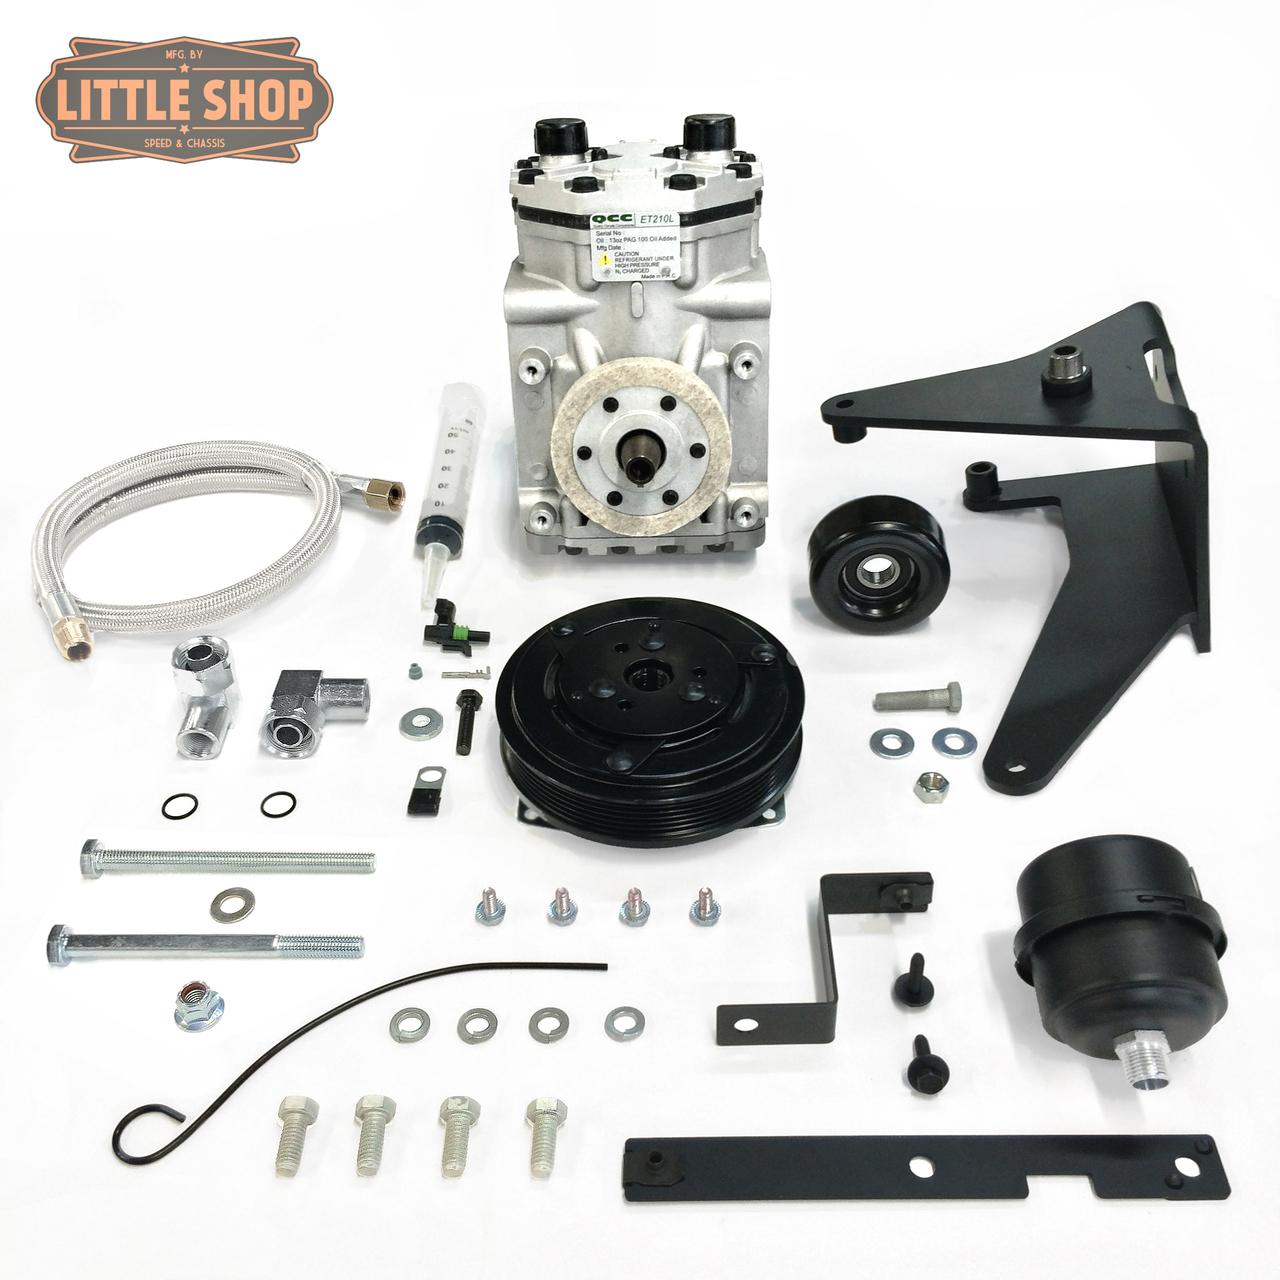 LSMFG-LS-EDC 99'-13' GM 4.8, 5.3, 6.0, 6.2 LS Engine Driven Compressor Kit